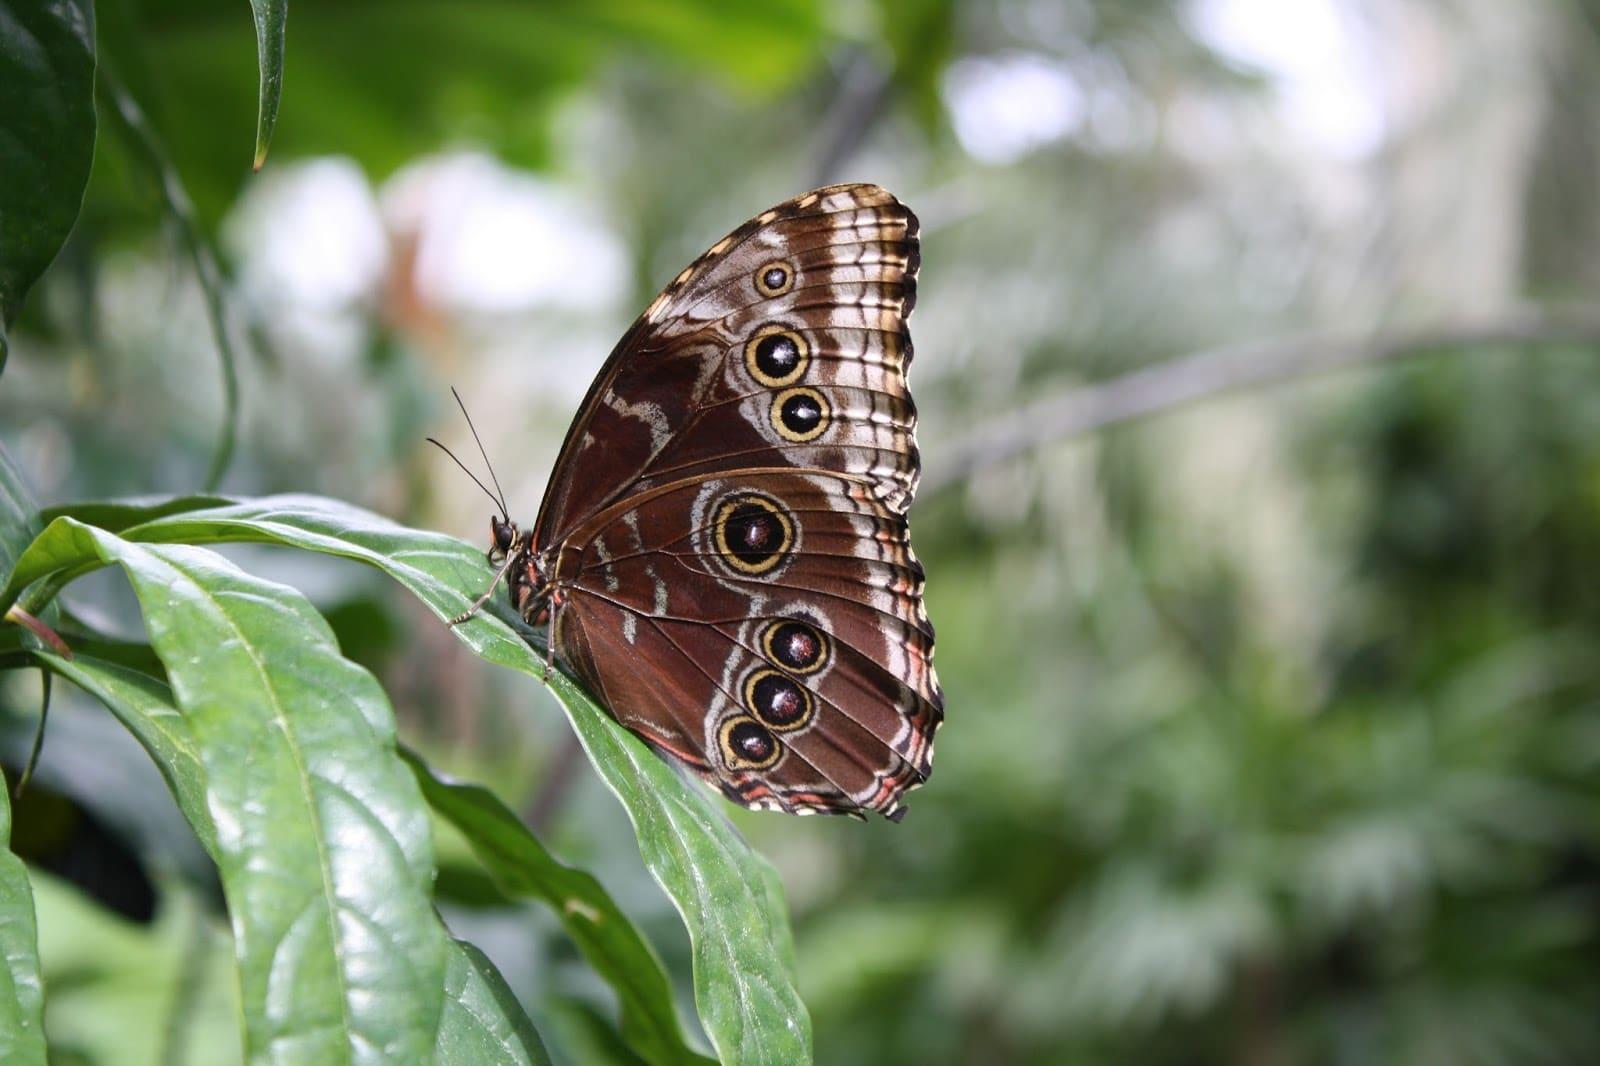 Blue morpho butterfly on leaf